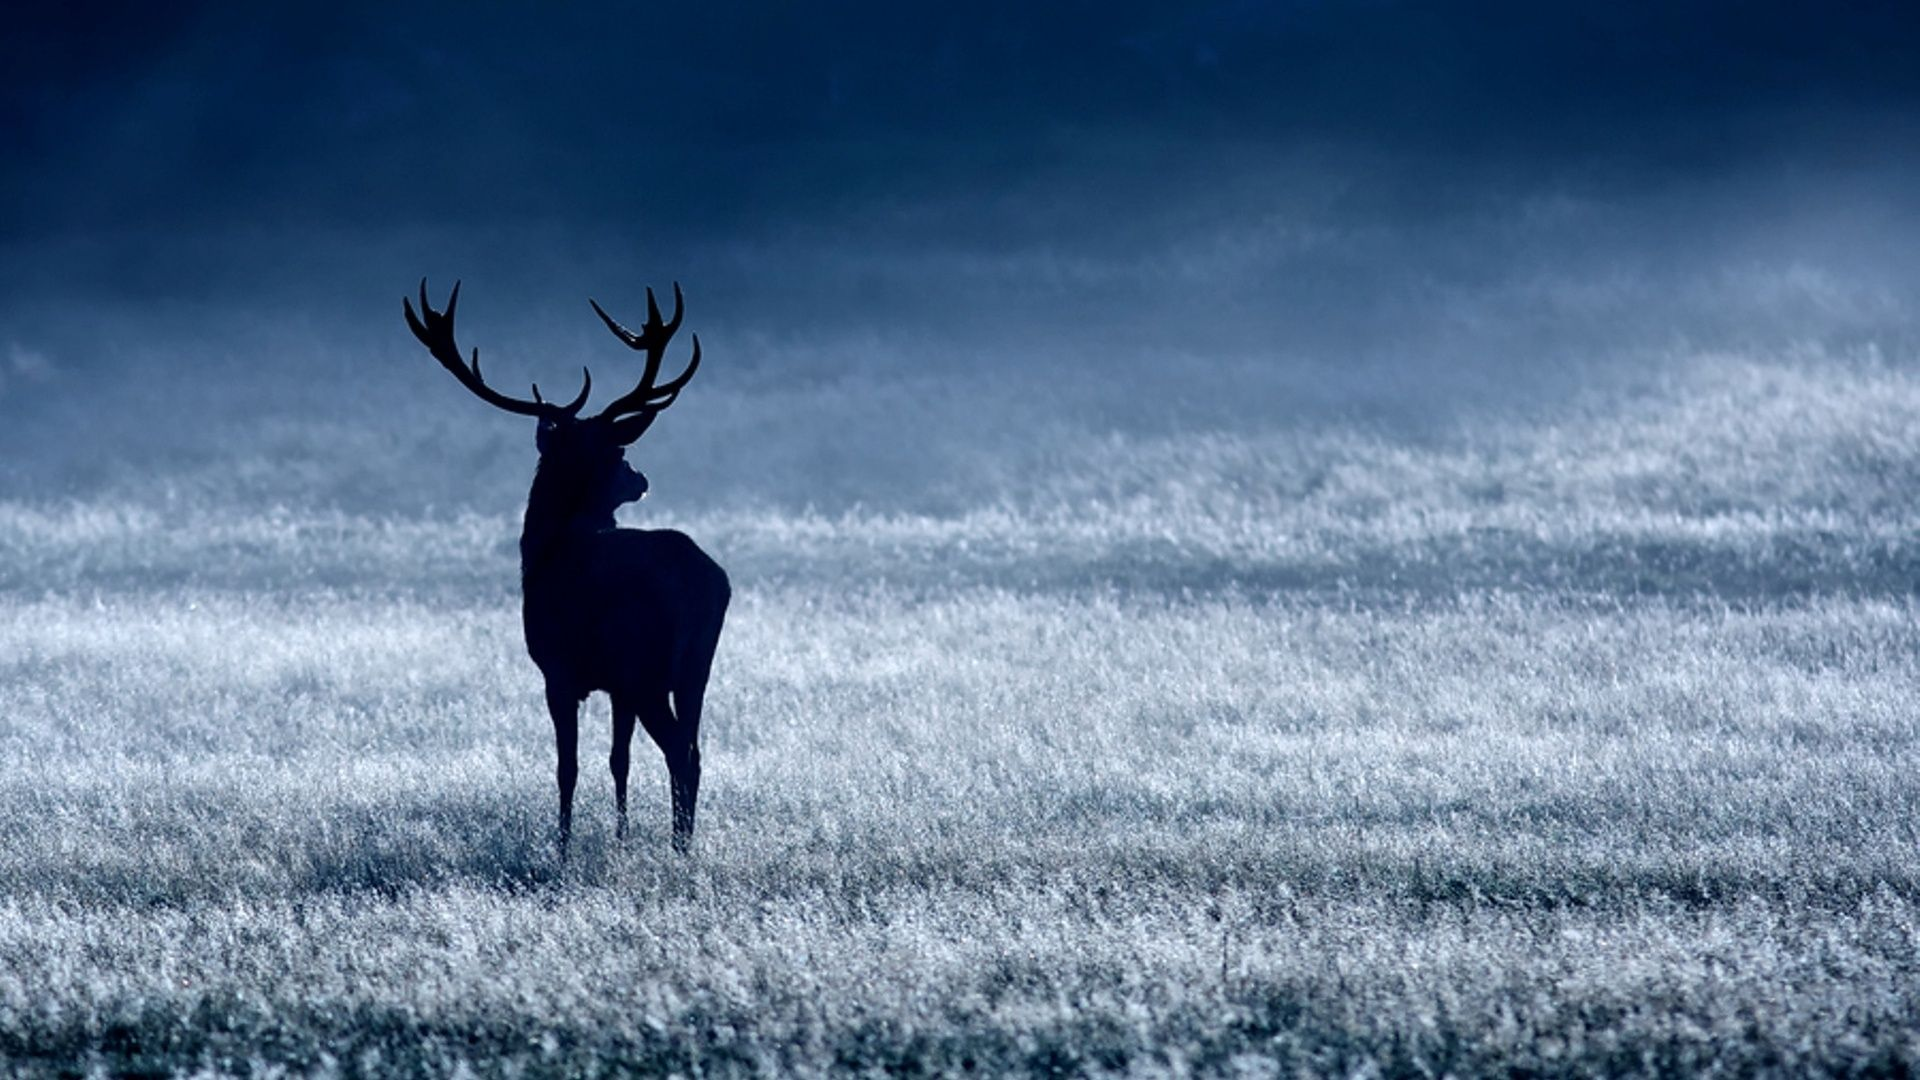 deer wallpaper for free